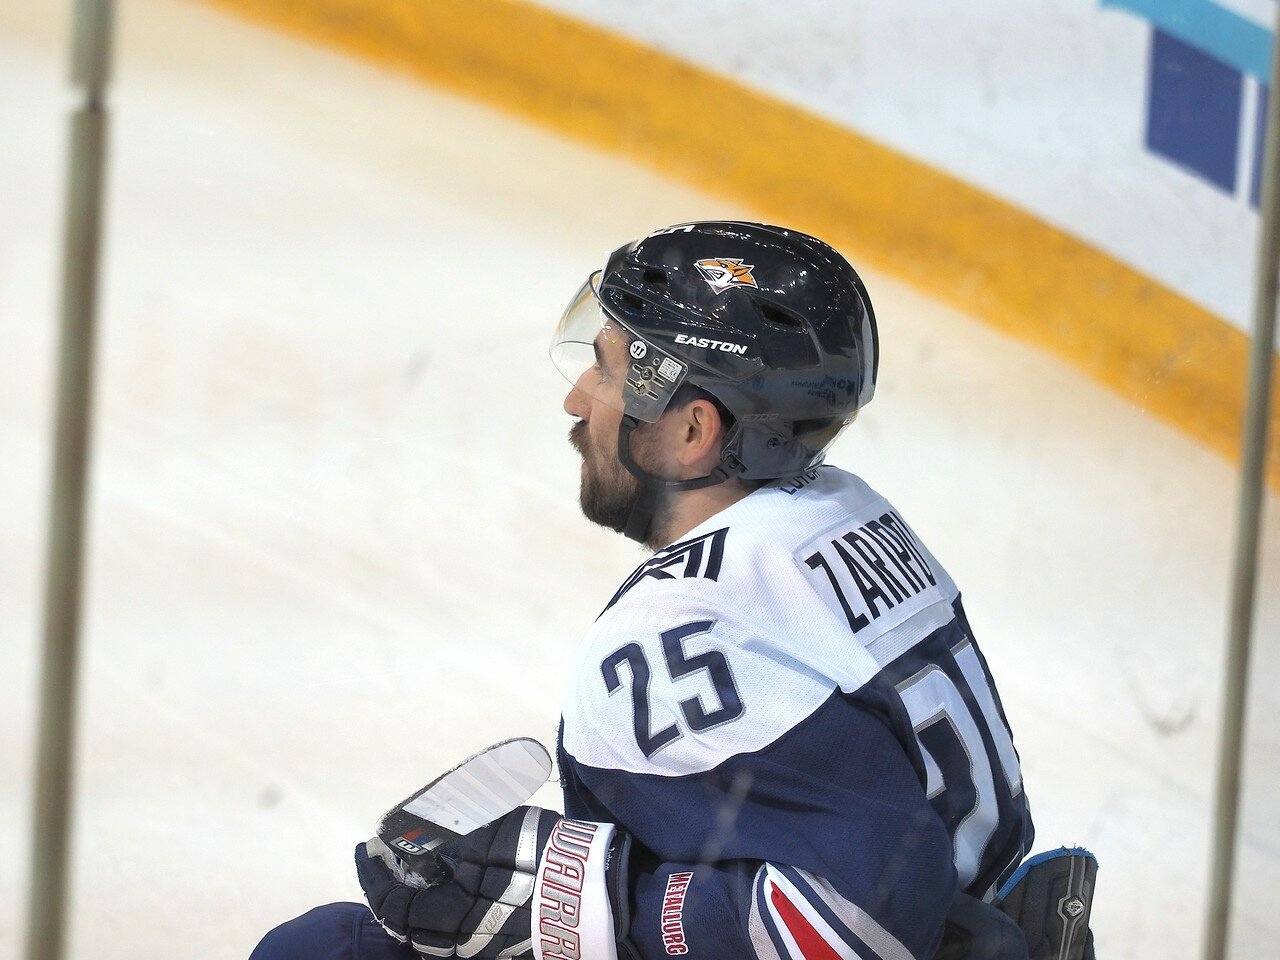 38Плей-офф 2016 Восток Финал Металлург - Салават Юлаев 23.03.2016